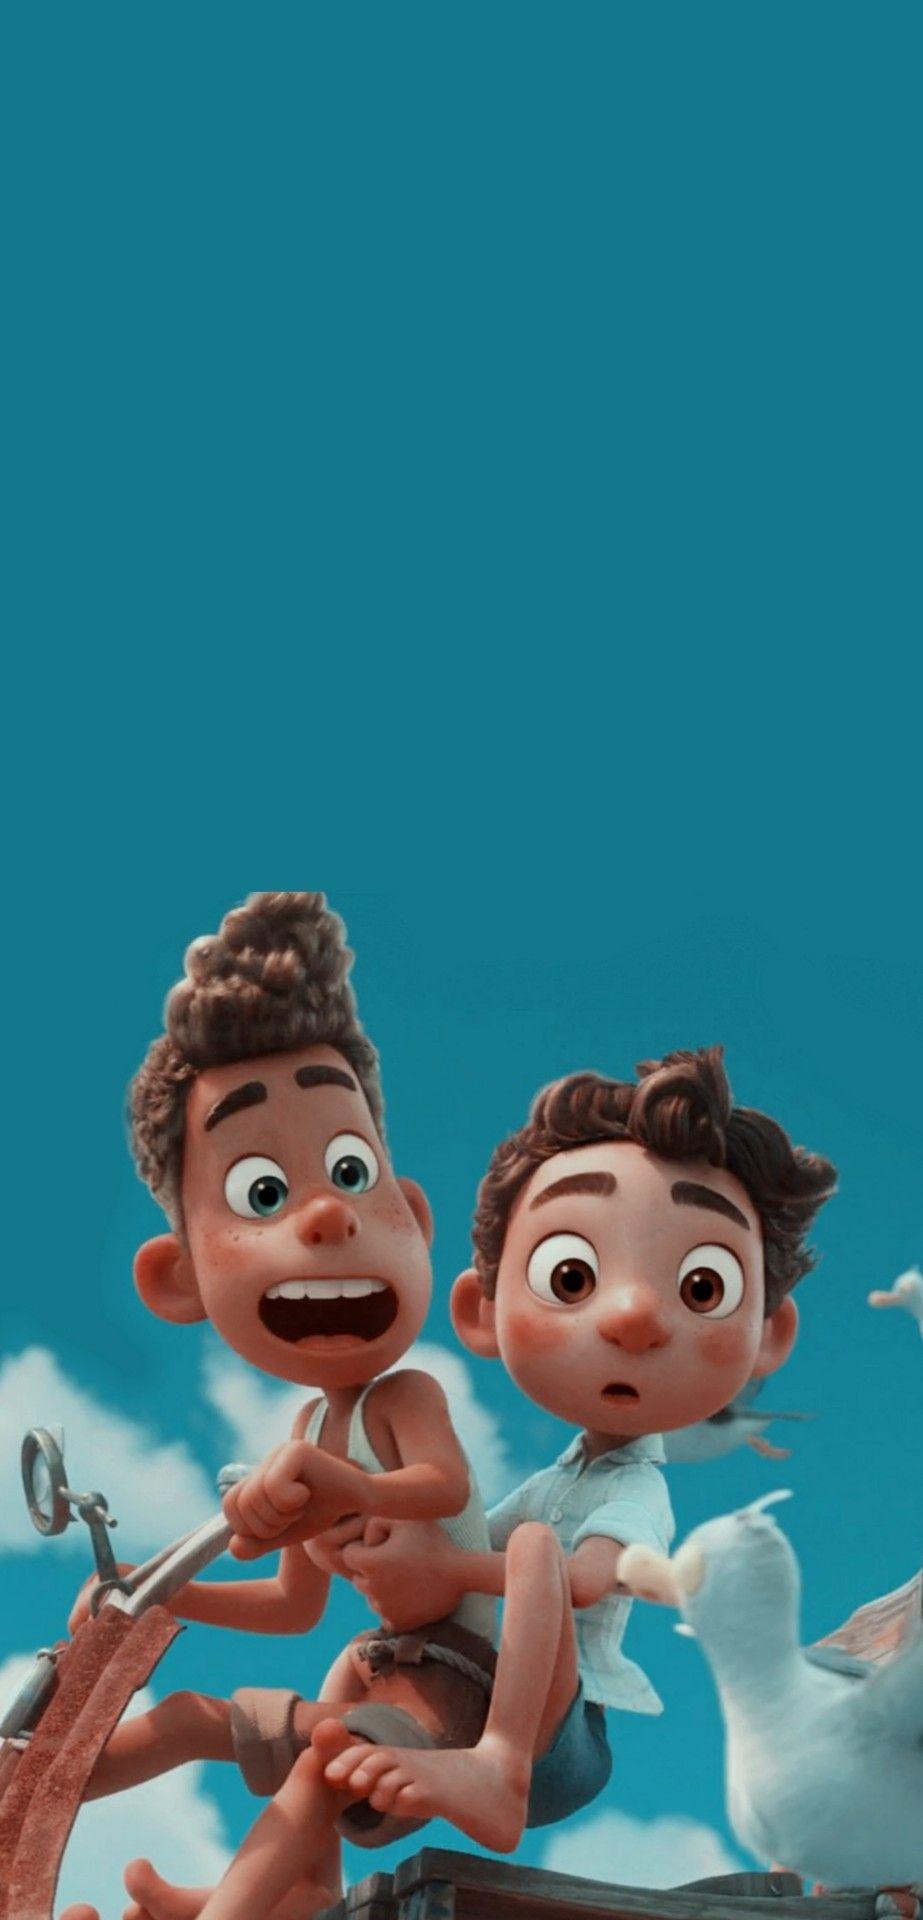 Luca Lockscreen In 2021 Disney Collage Disney Wallpaper Cute Disney Wallpaper